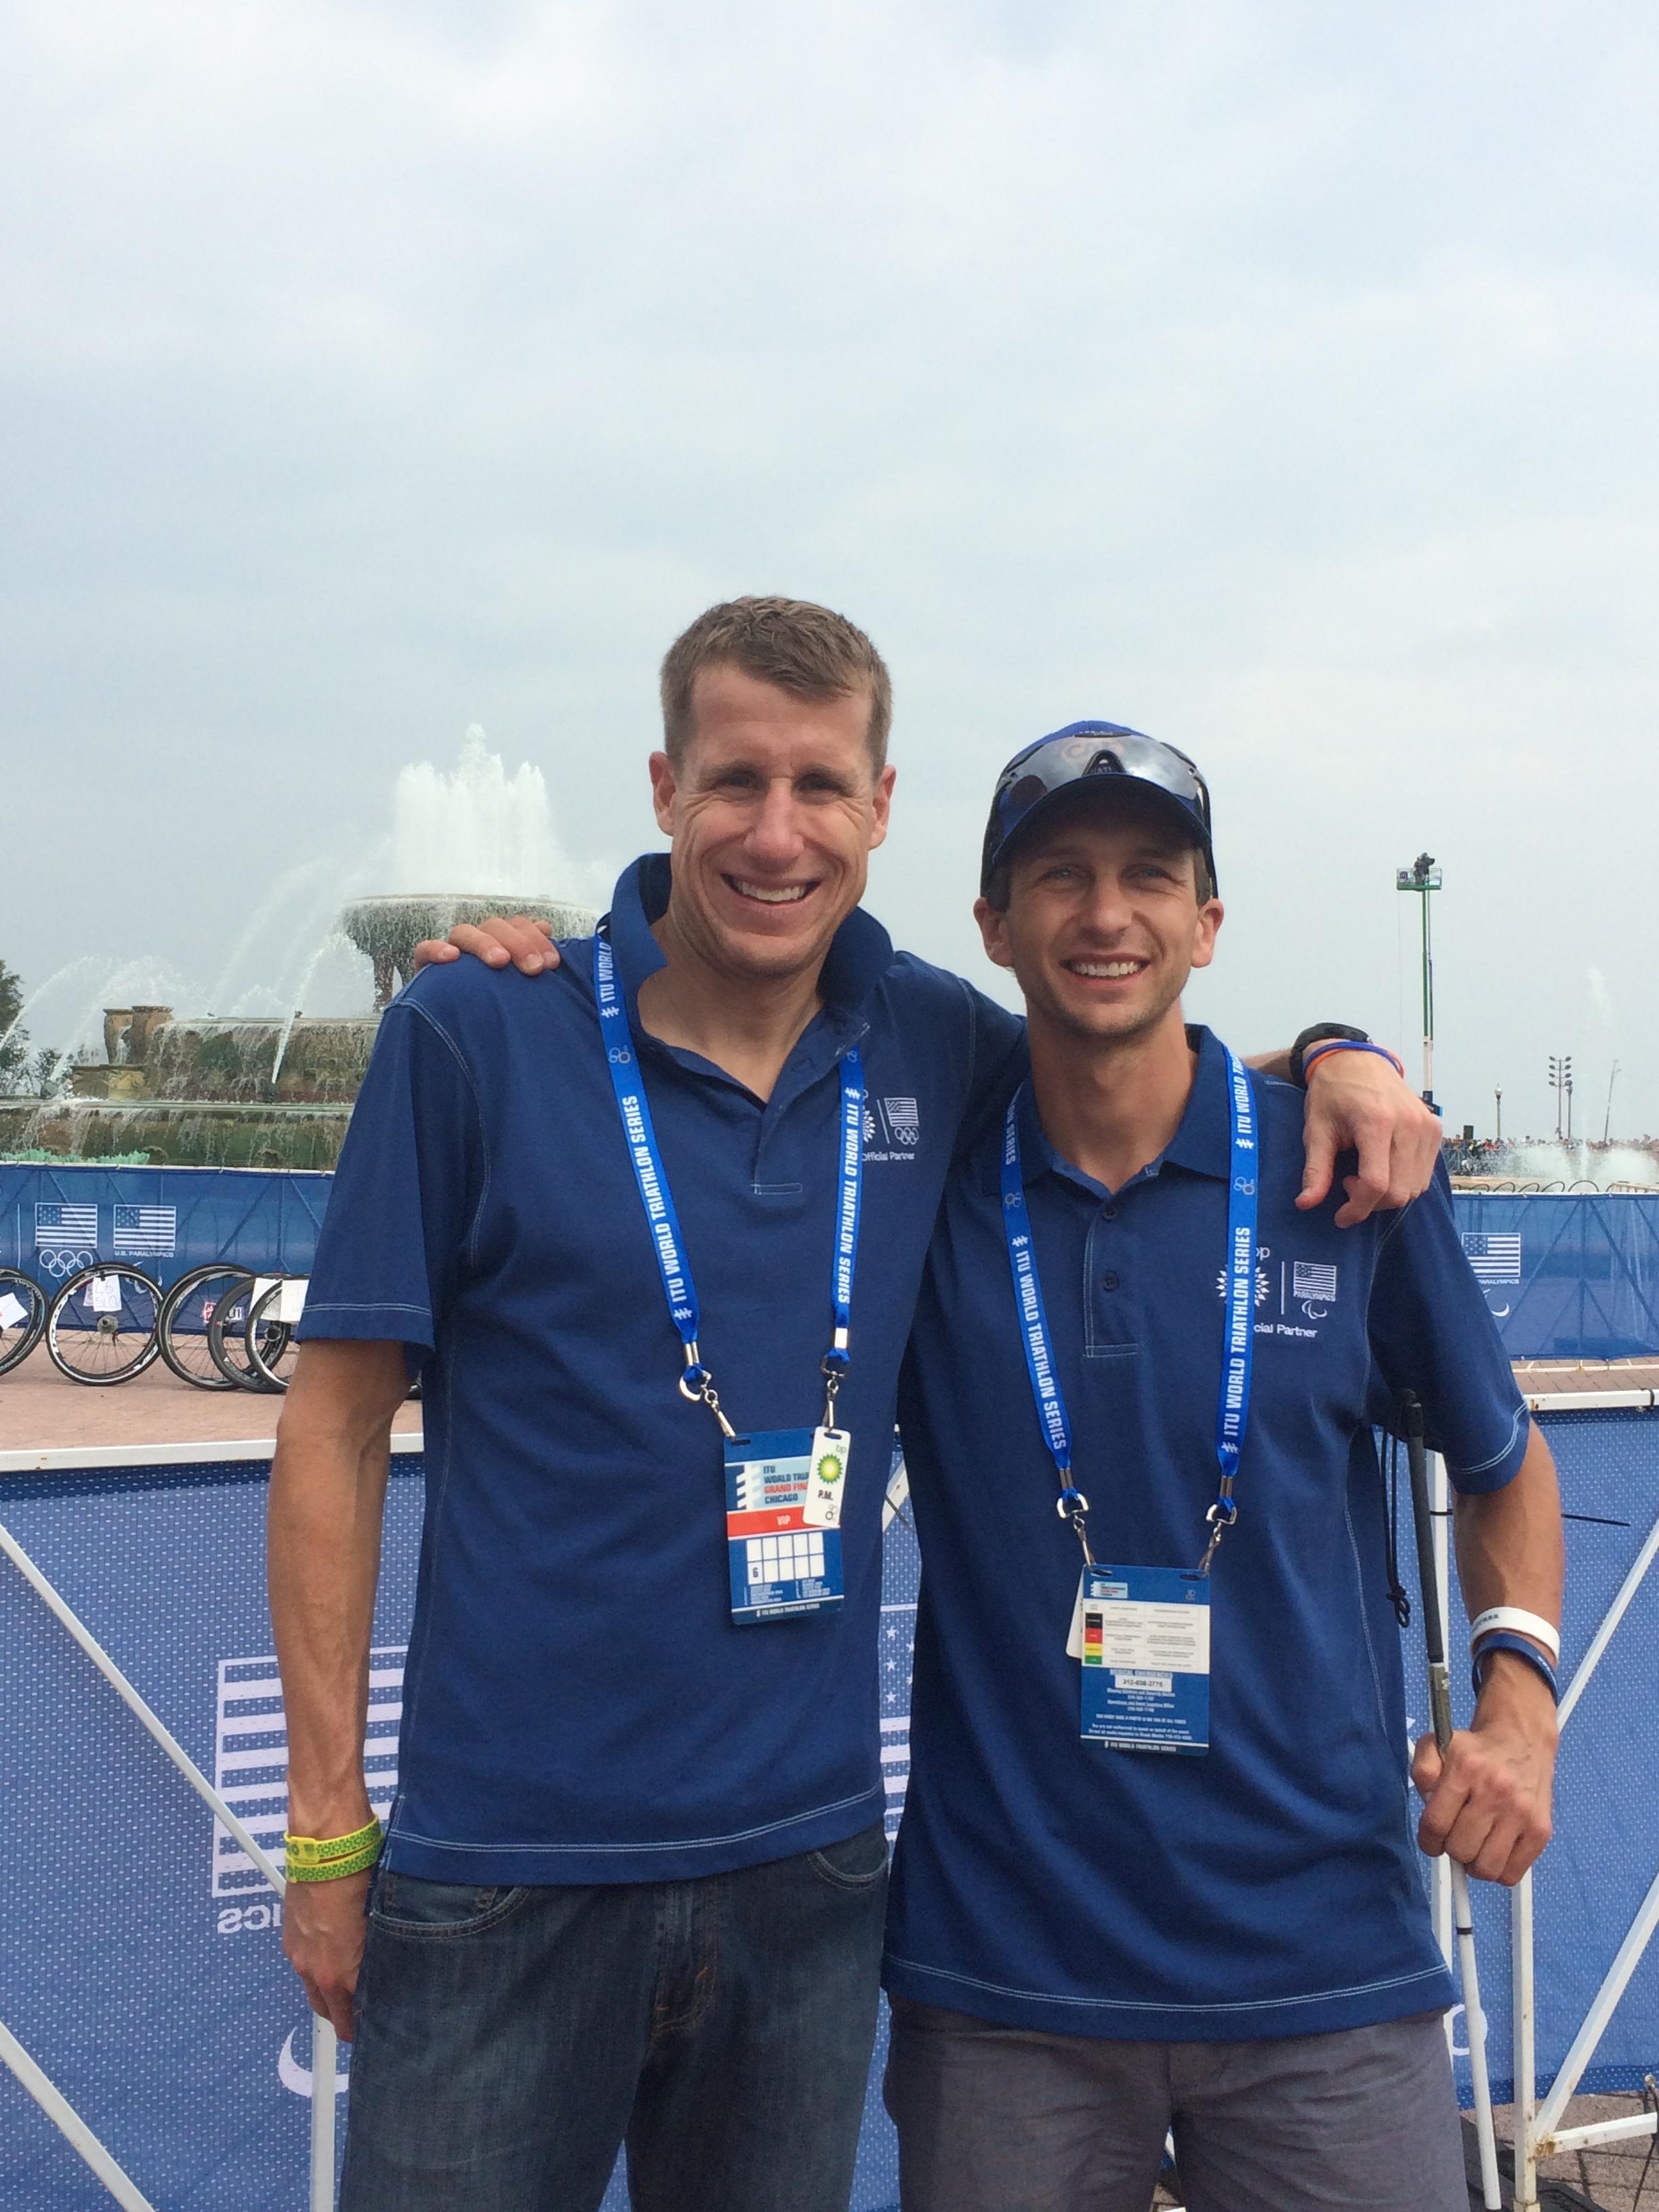 Hunter Kemper and I representing BP in Chicago at ITU World Championships 2015.